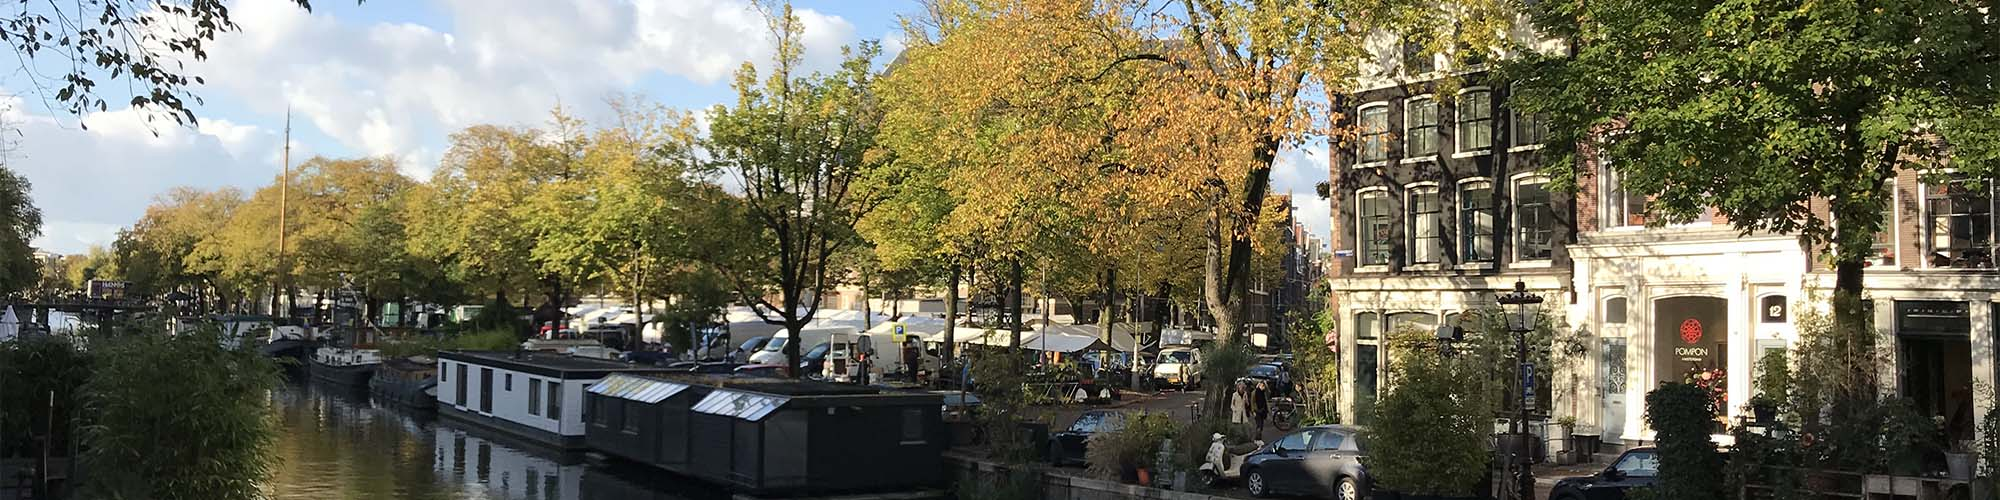 https://www.noordermarkt-amsterdam.nl/uploads/images/fotostroke/Noordermarkt-3.jpg